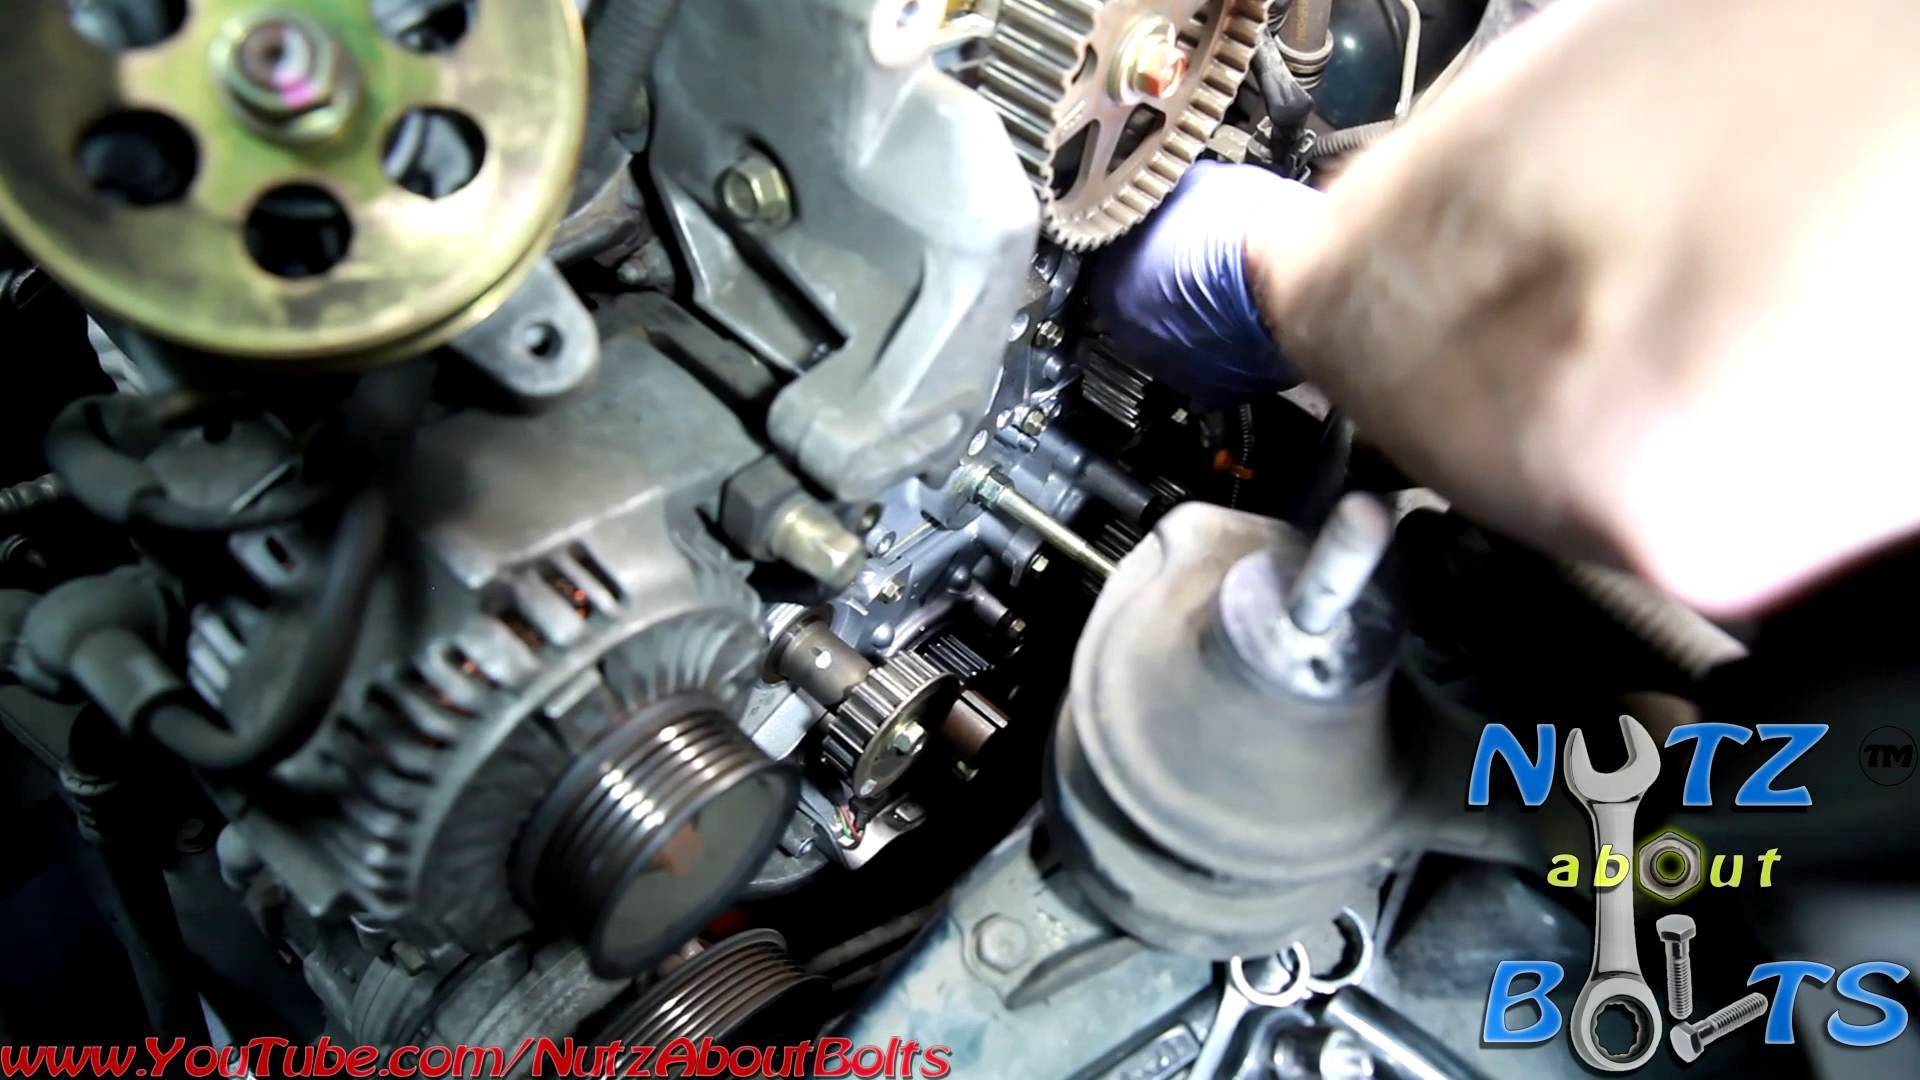 2006 Honda Accord Engine Diagram 1998 2002 Honda Accord Timing Belt Replacement with Water Pump Of 2006 Honda Accord Engine Diagram